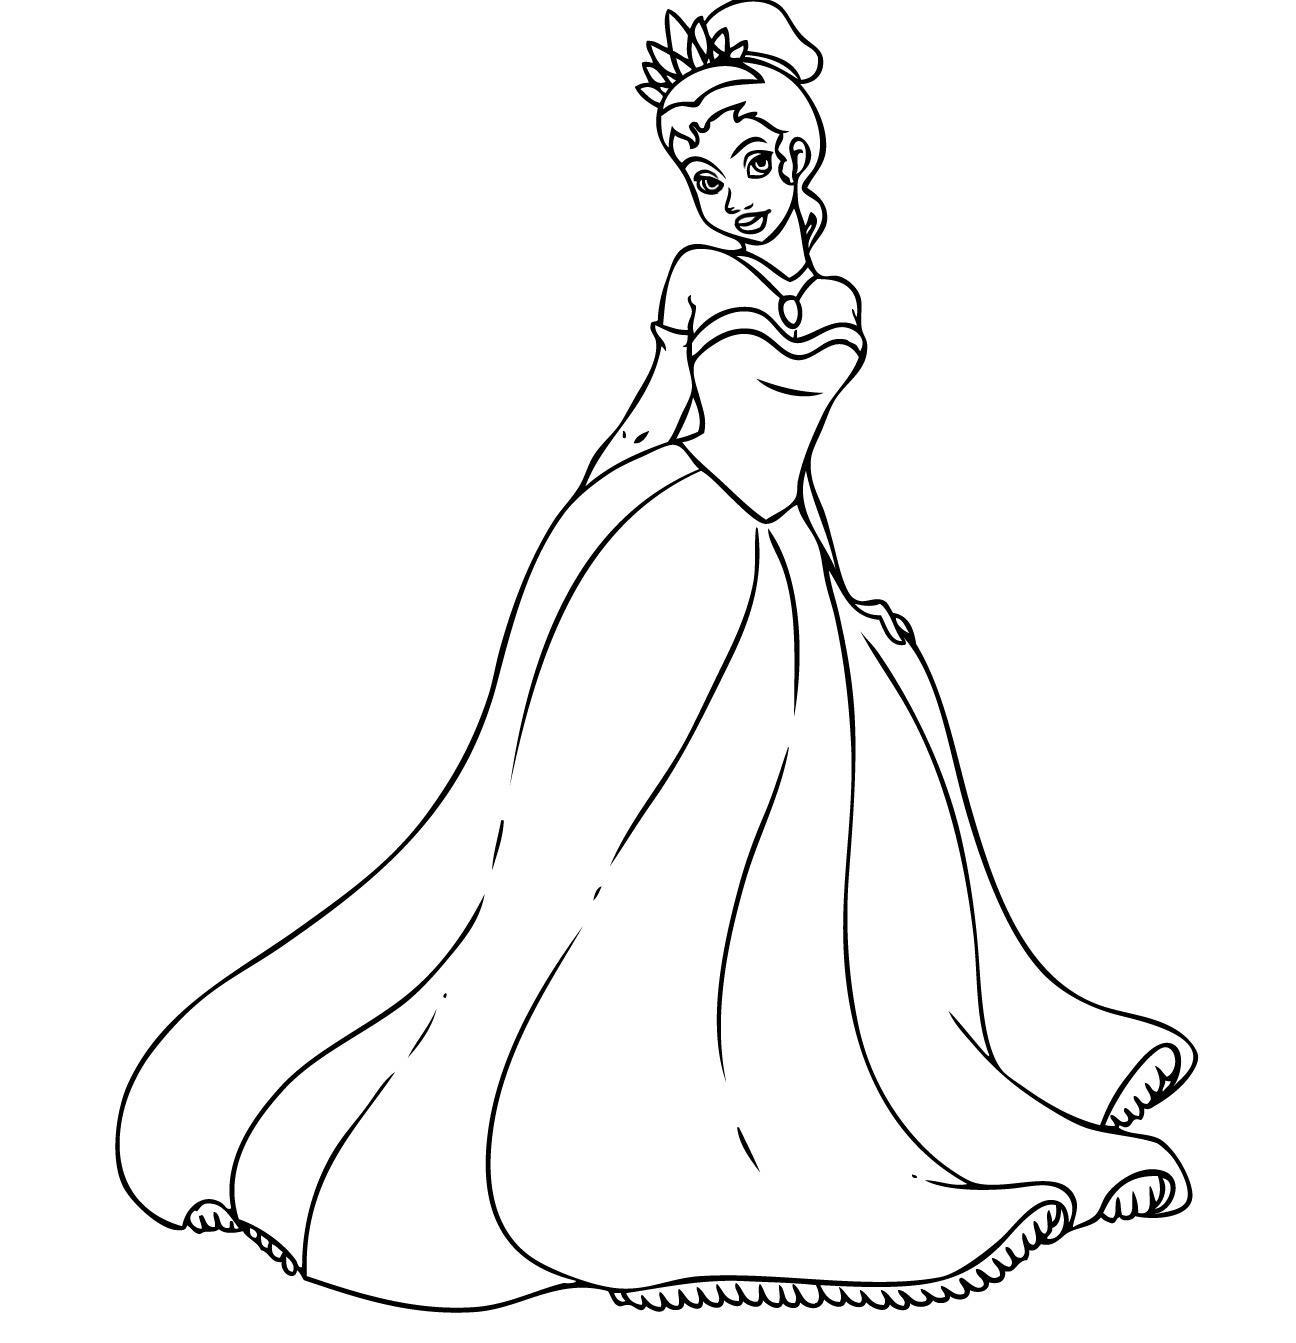 coloring pages of princess tiana